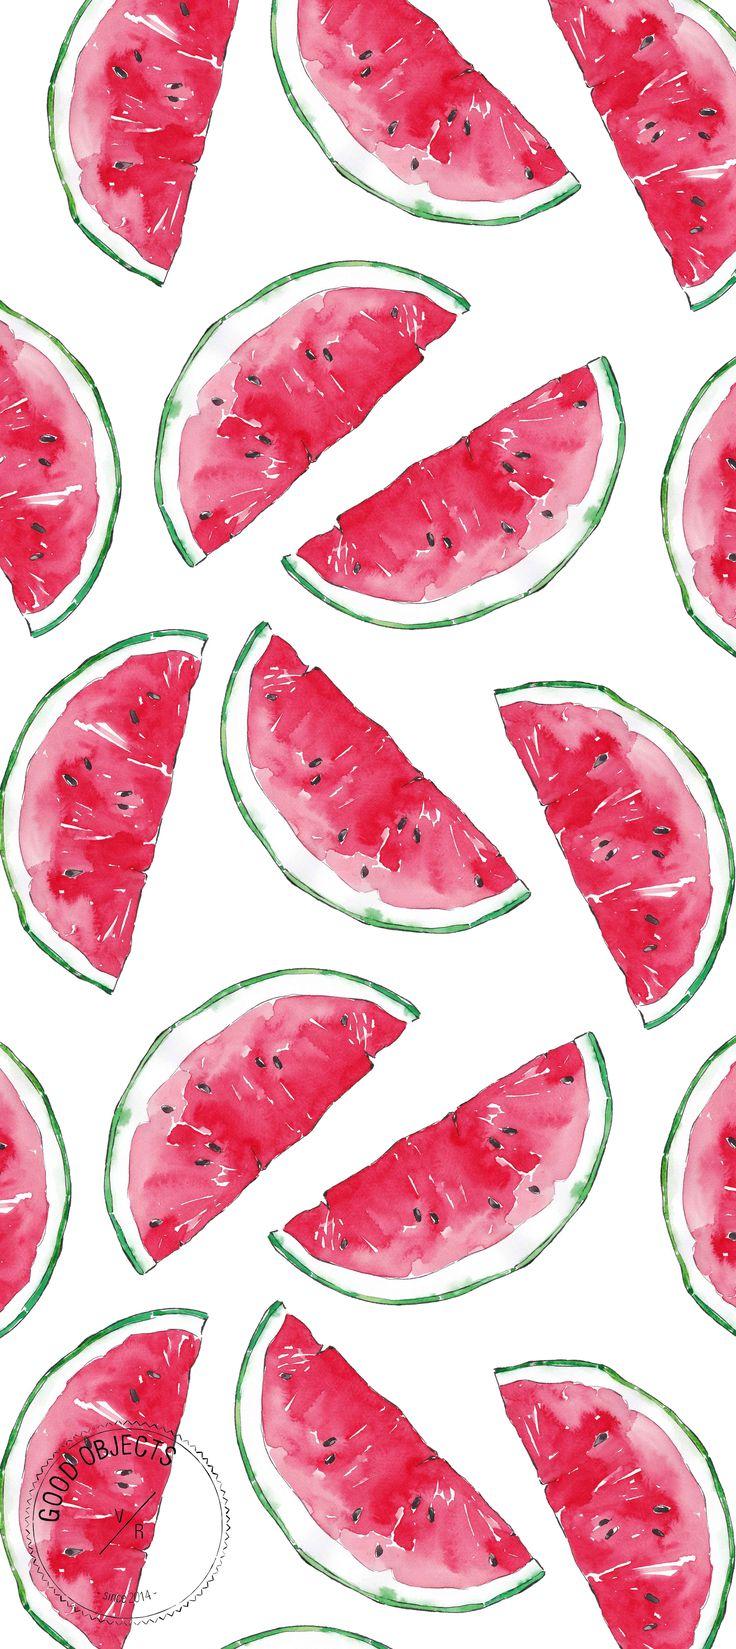 Good objects - Watermelon watercolor illustration pattern